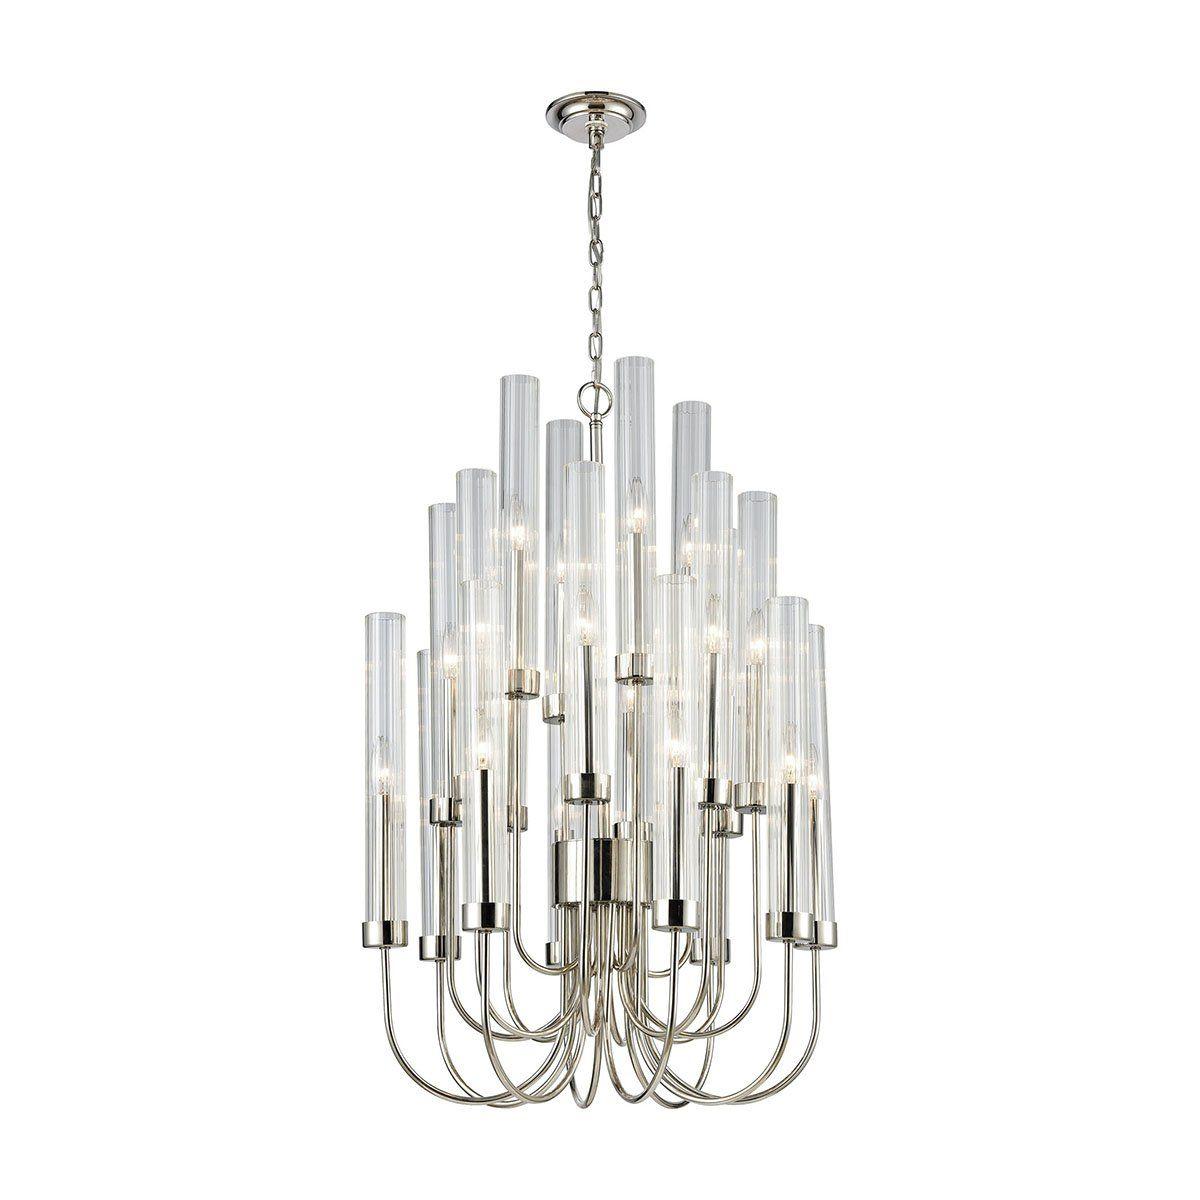 Dimond lighting 1141067 shasta twenty light chandelier